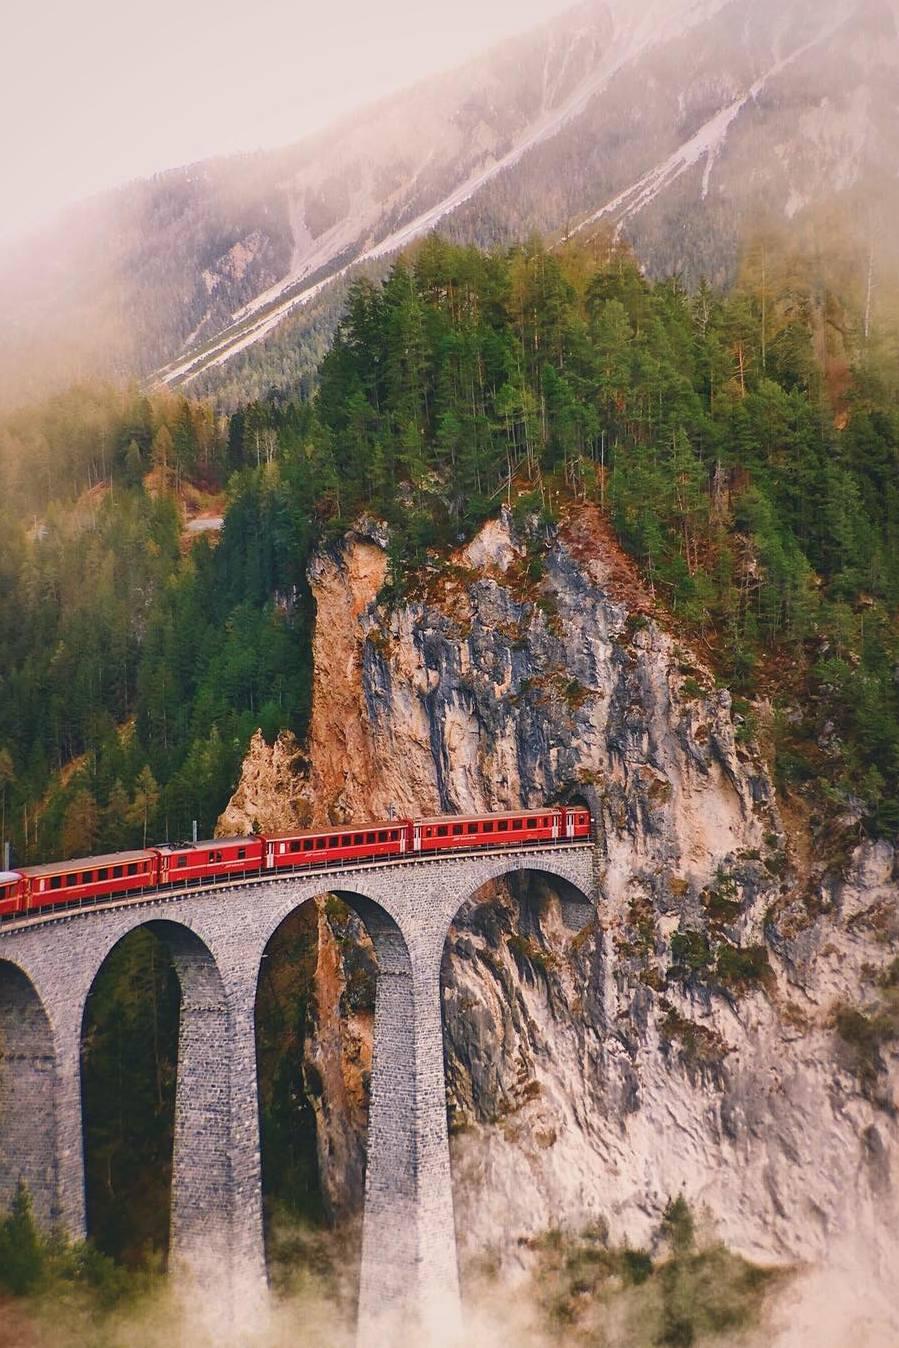 train mountain bridge travel landscape tree nature fog architecture road sky